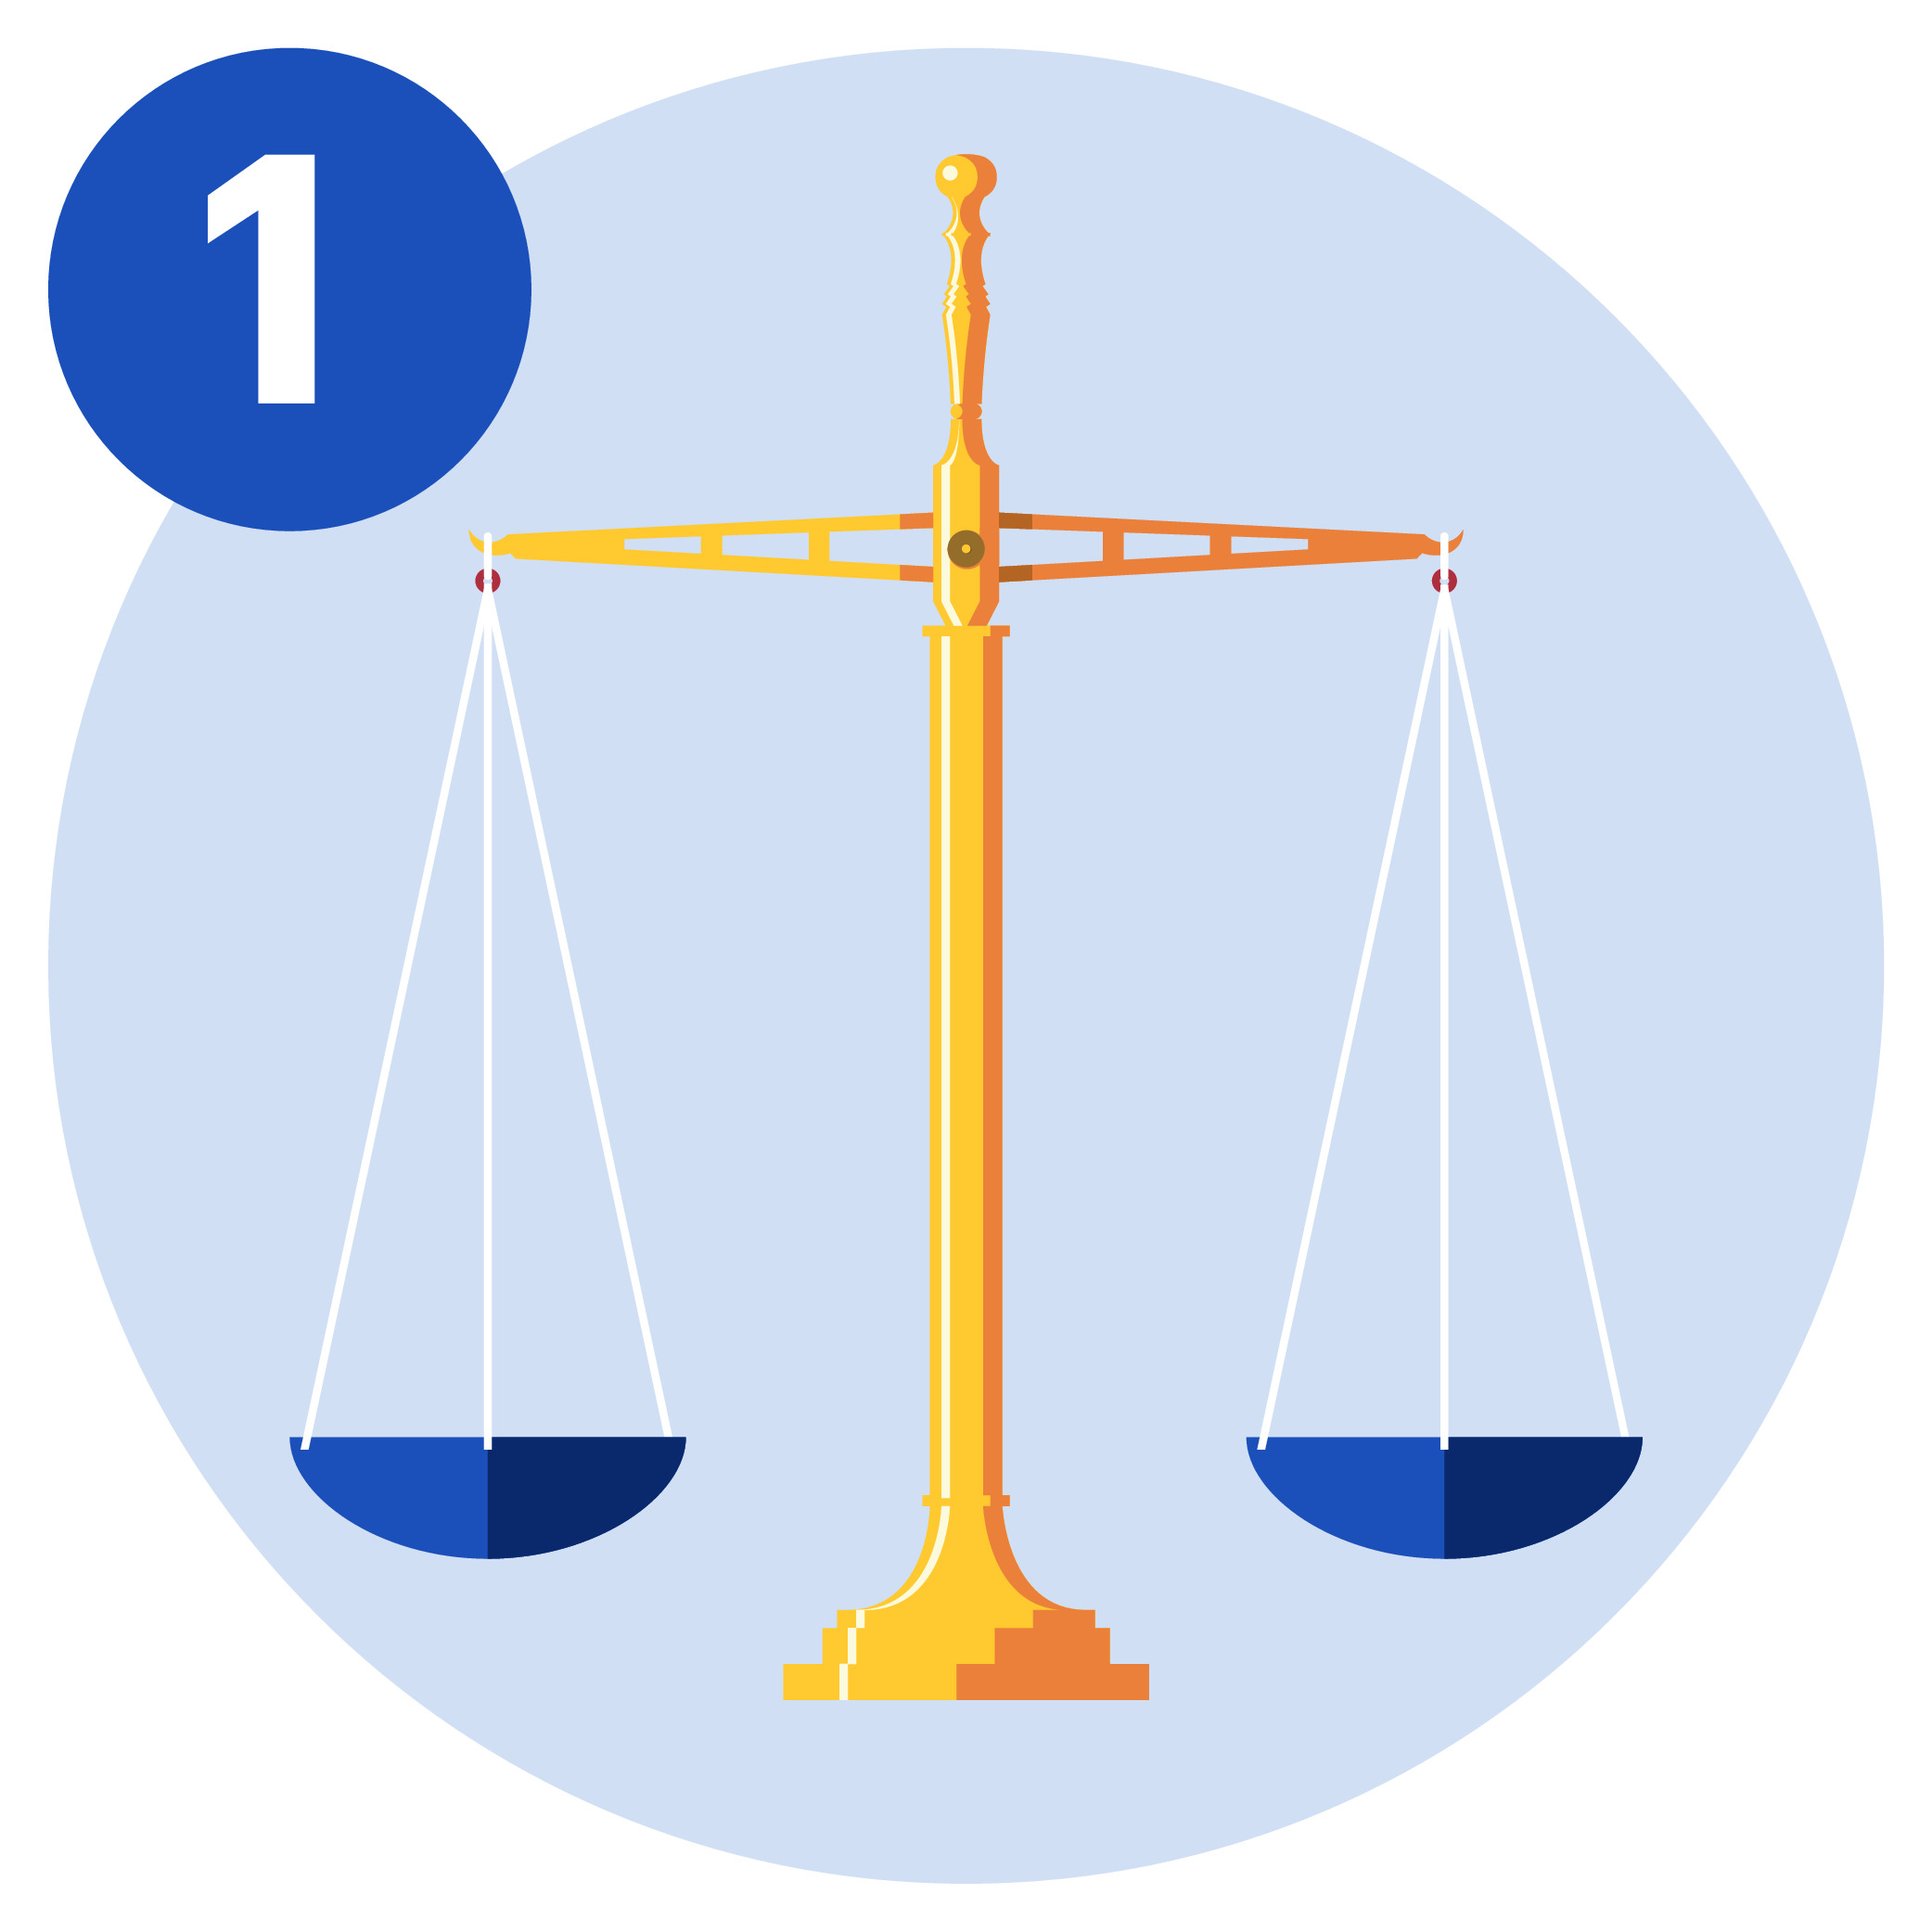 #1 A balance scale